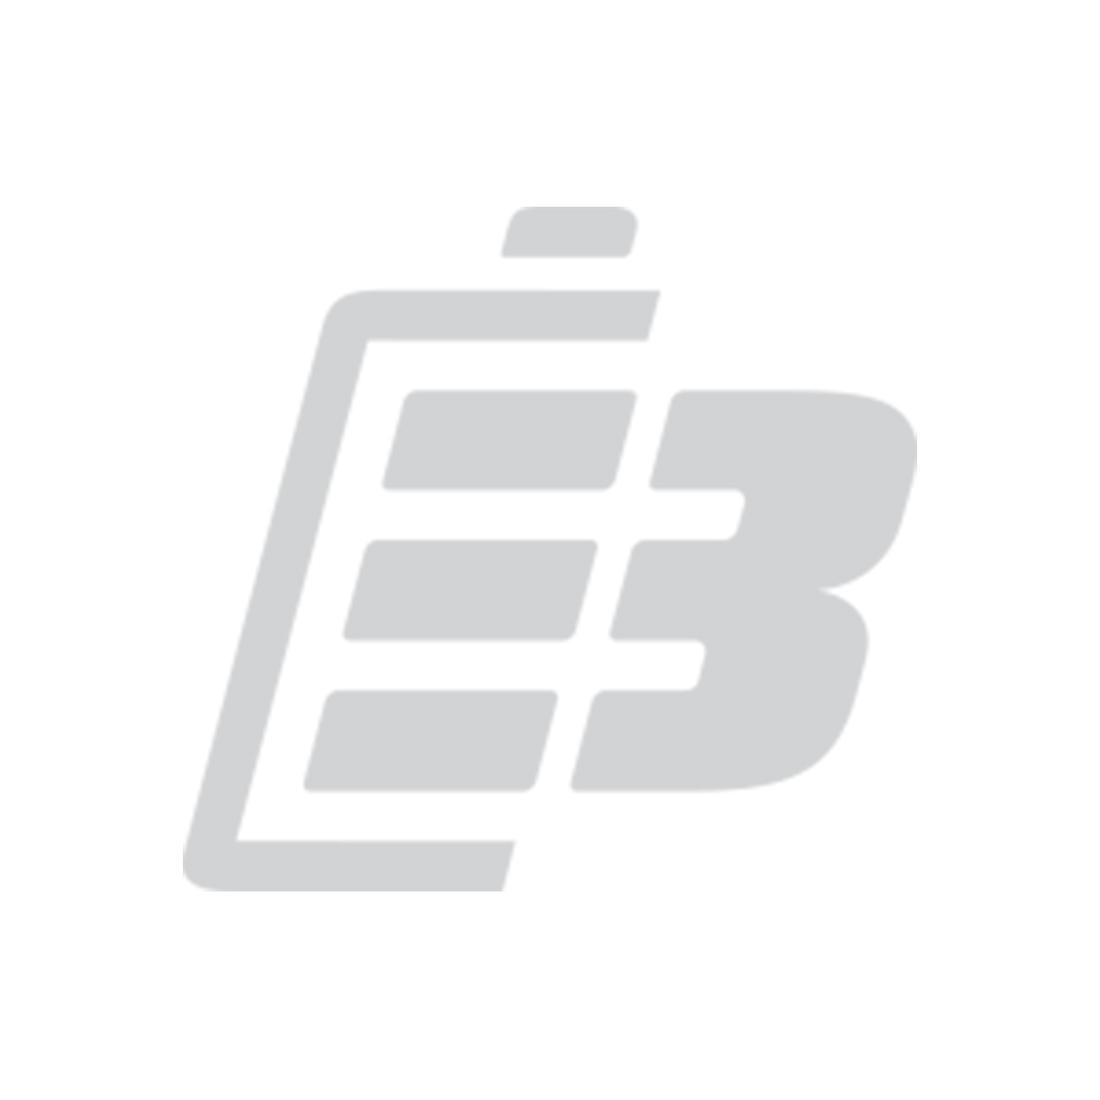 e-book reader battery Amazon Kindle 2_1